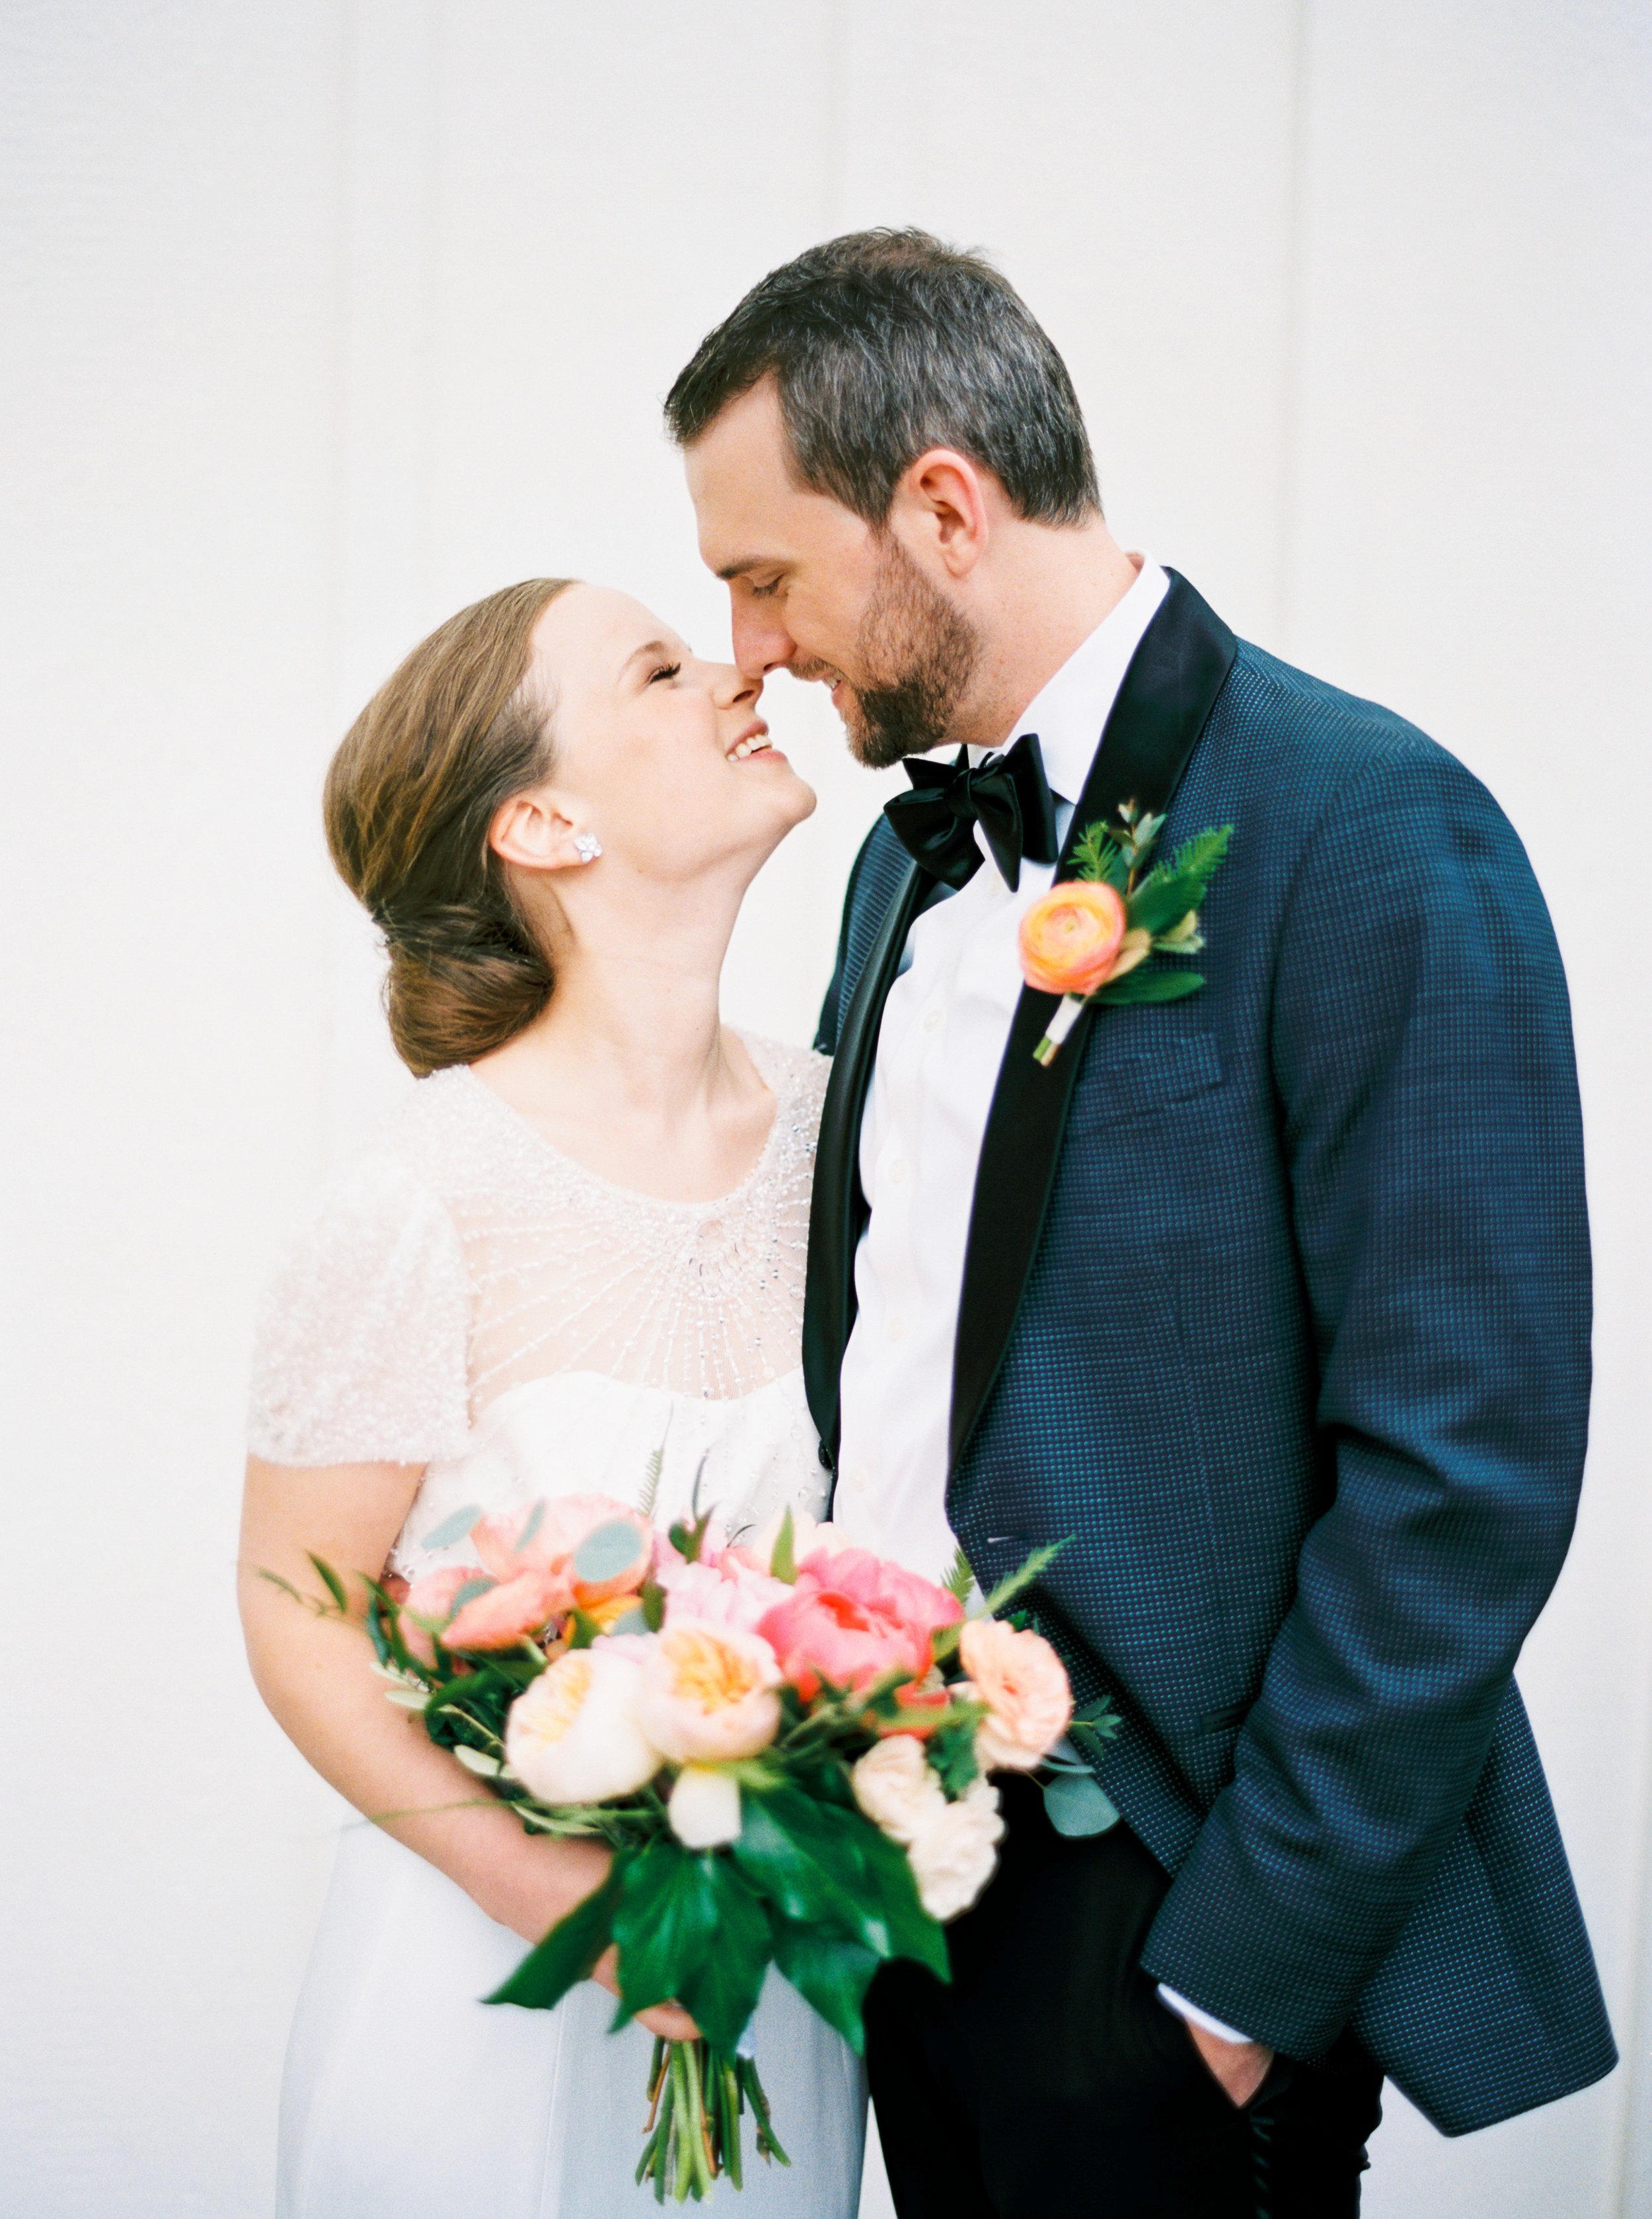 Joy-Unscripted-Wedding-Calligraphy-Colleen-267.jpg